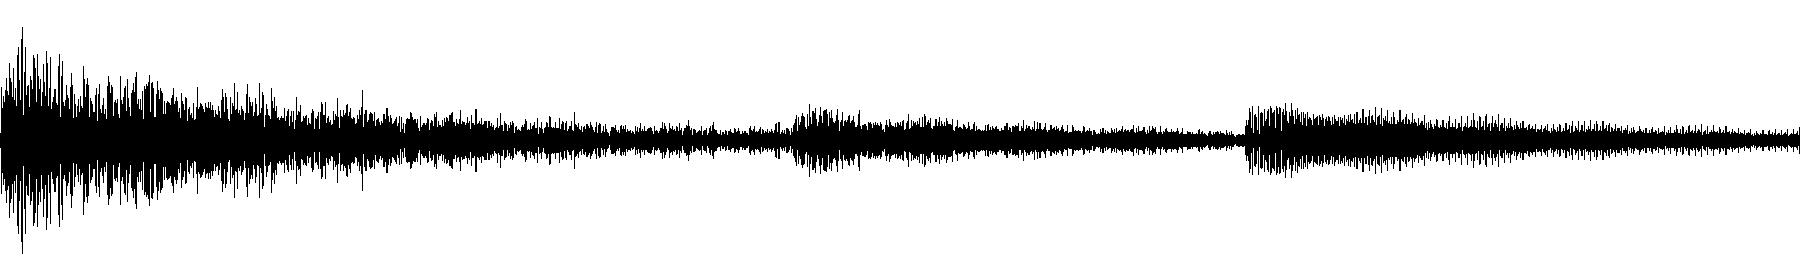 shs ch musicloop 127 epiano3 cm